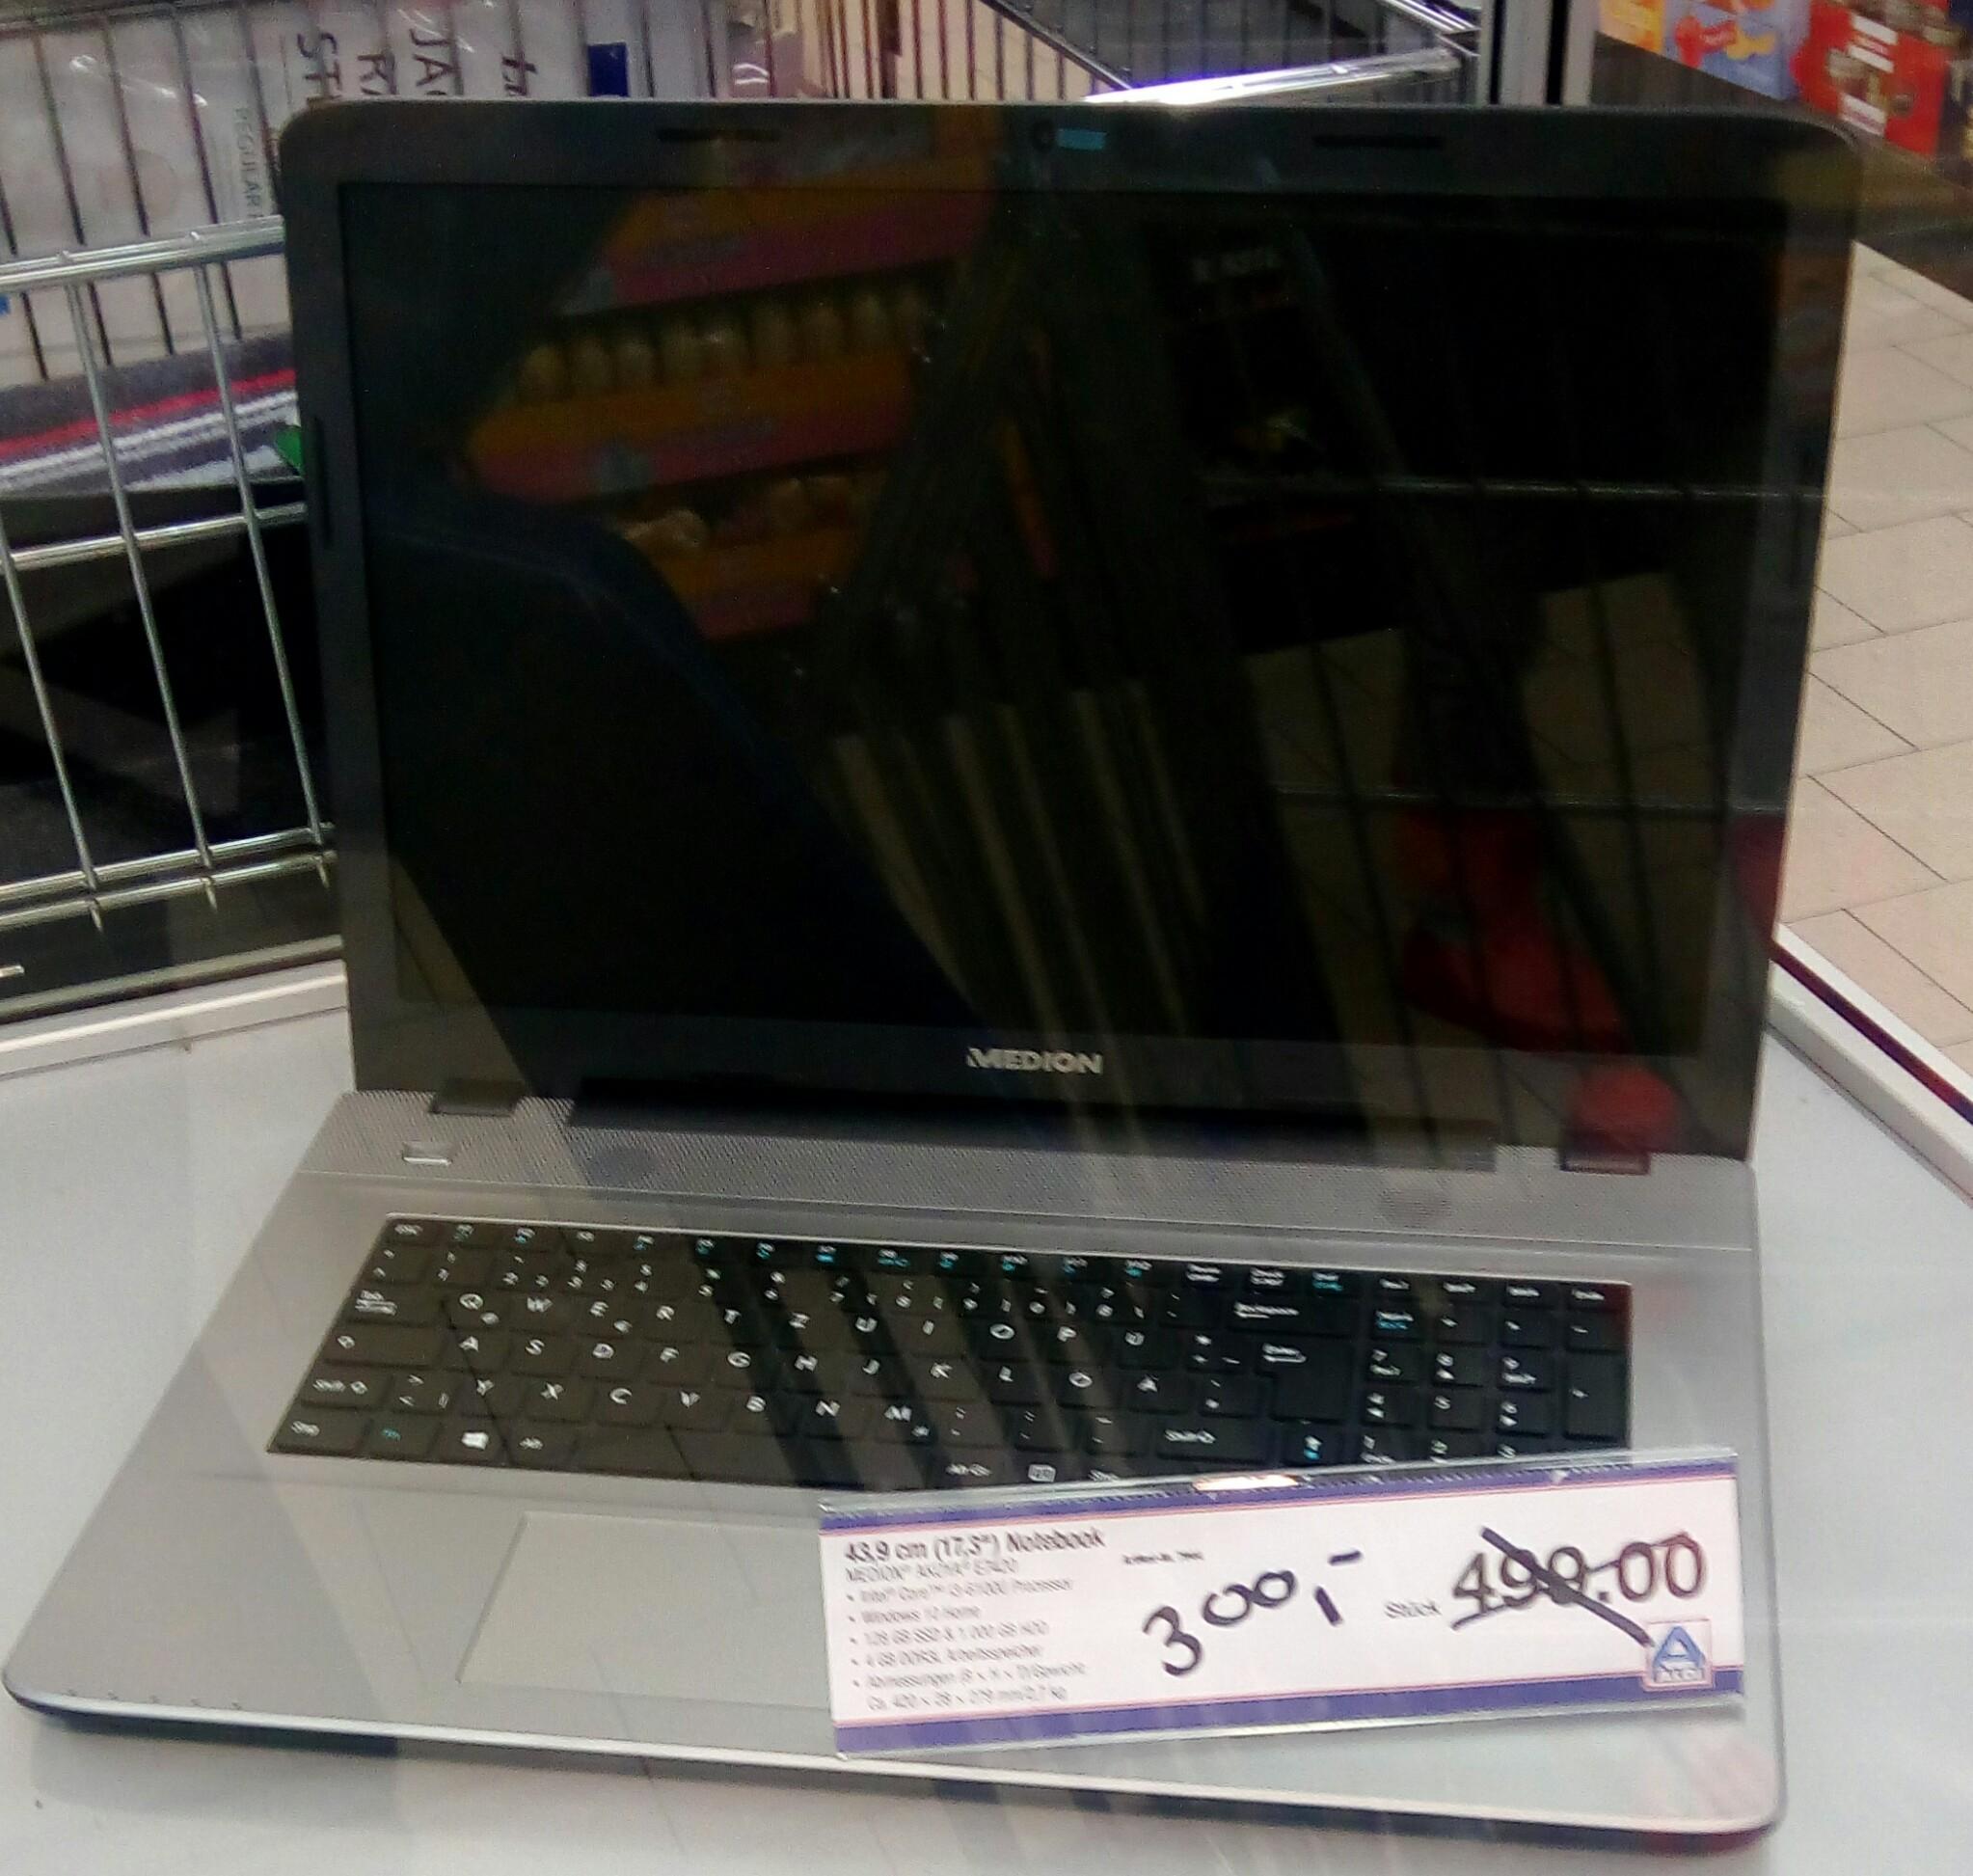 Abverkauf Notebook MEDION® AKOYA® E7420 (MD 99710) Aldi Nord Dabringhausen